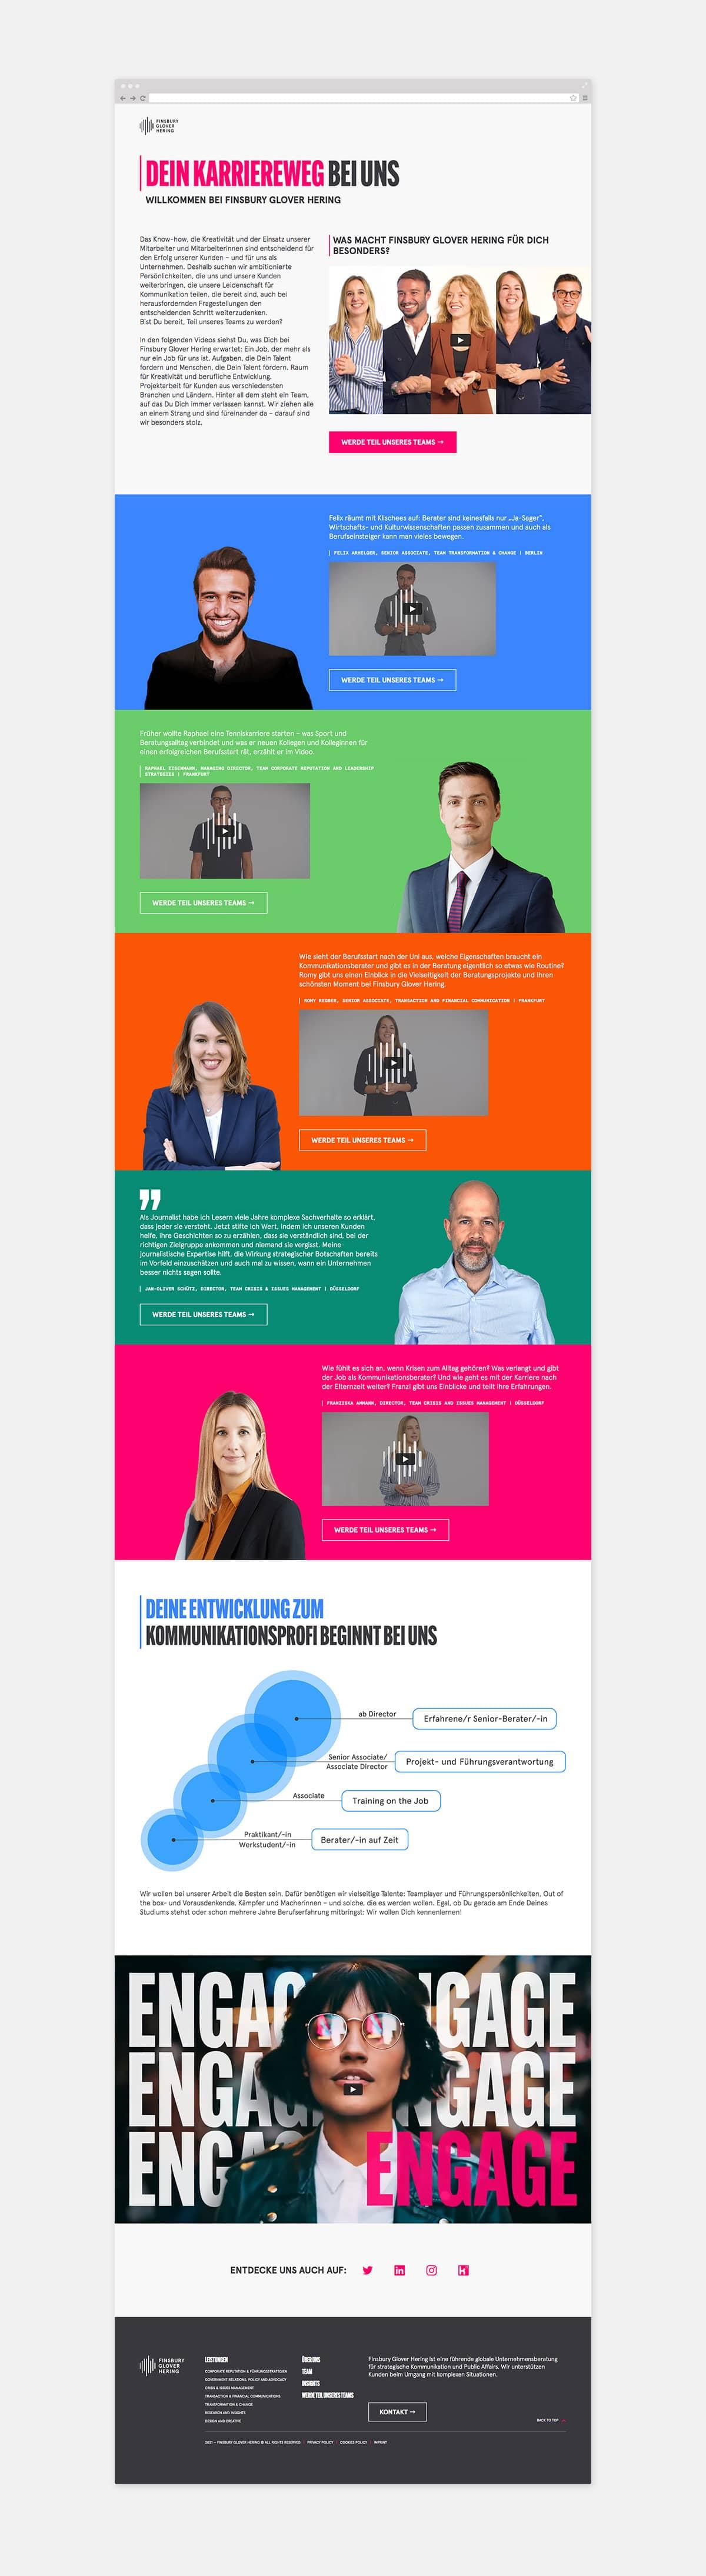 Recruiting-Website Finsbury Glover Hering